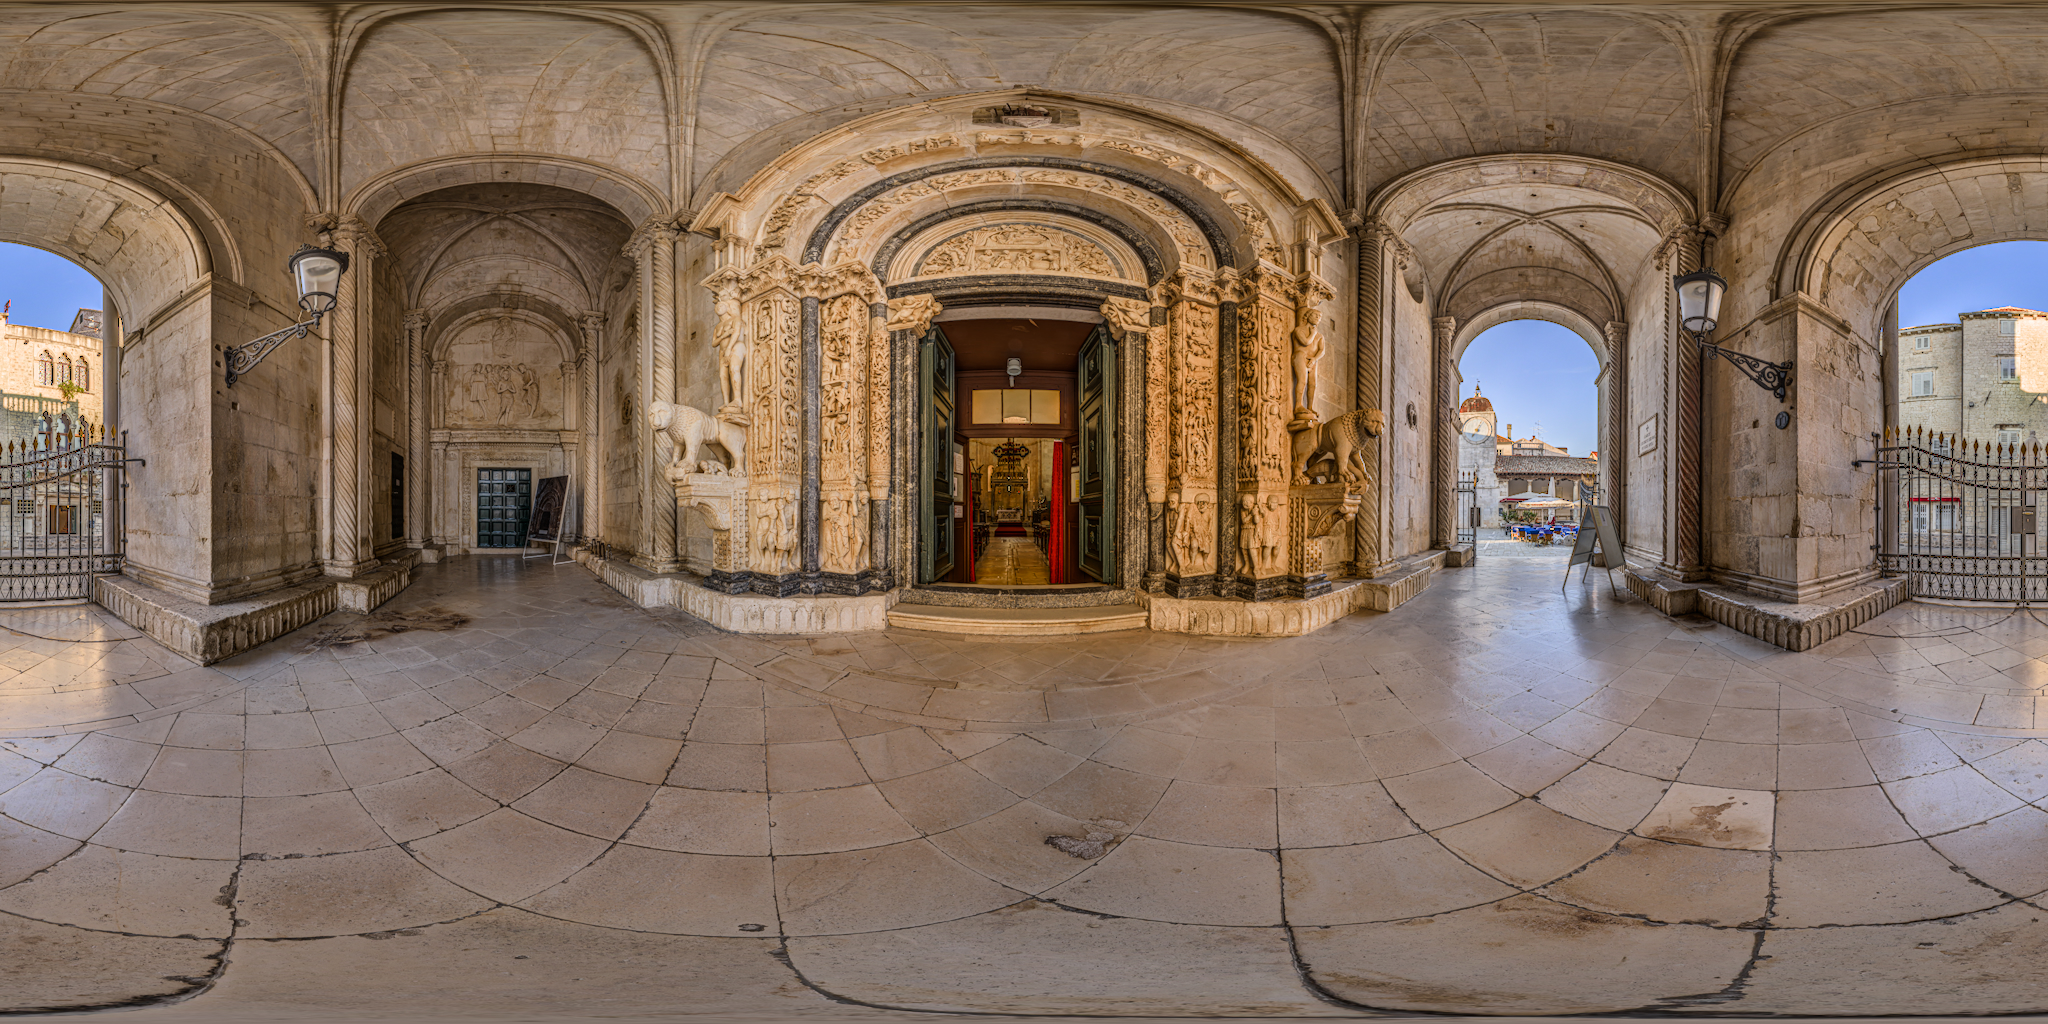 HDRI-Skies-Cathedral-Saint-Lovre-Entrance-Trogir